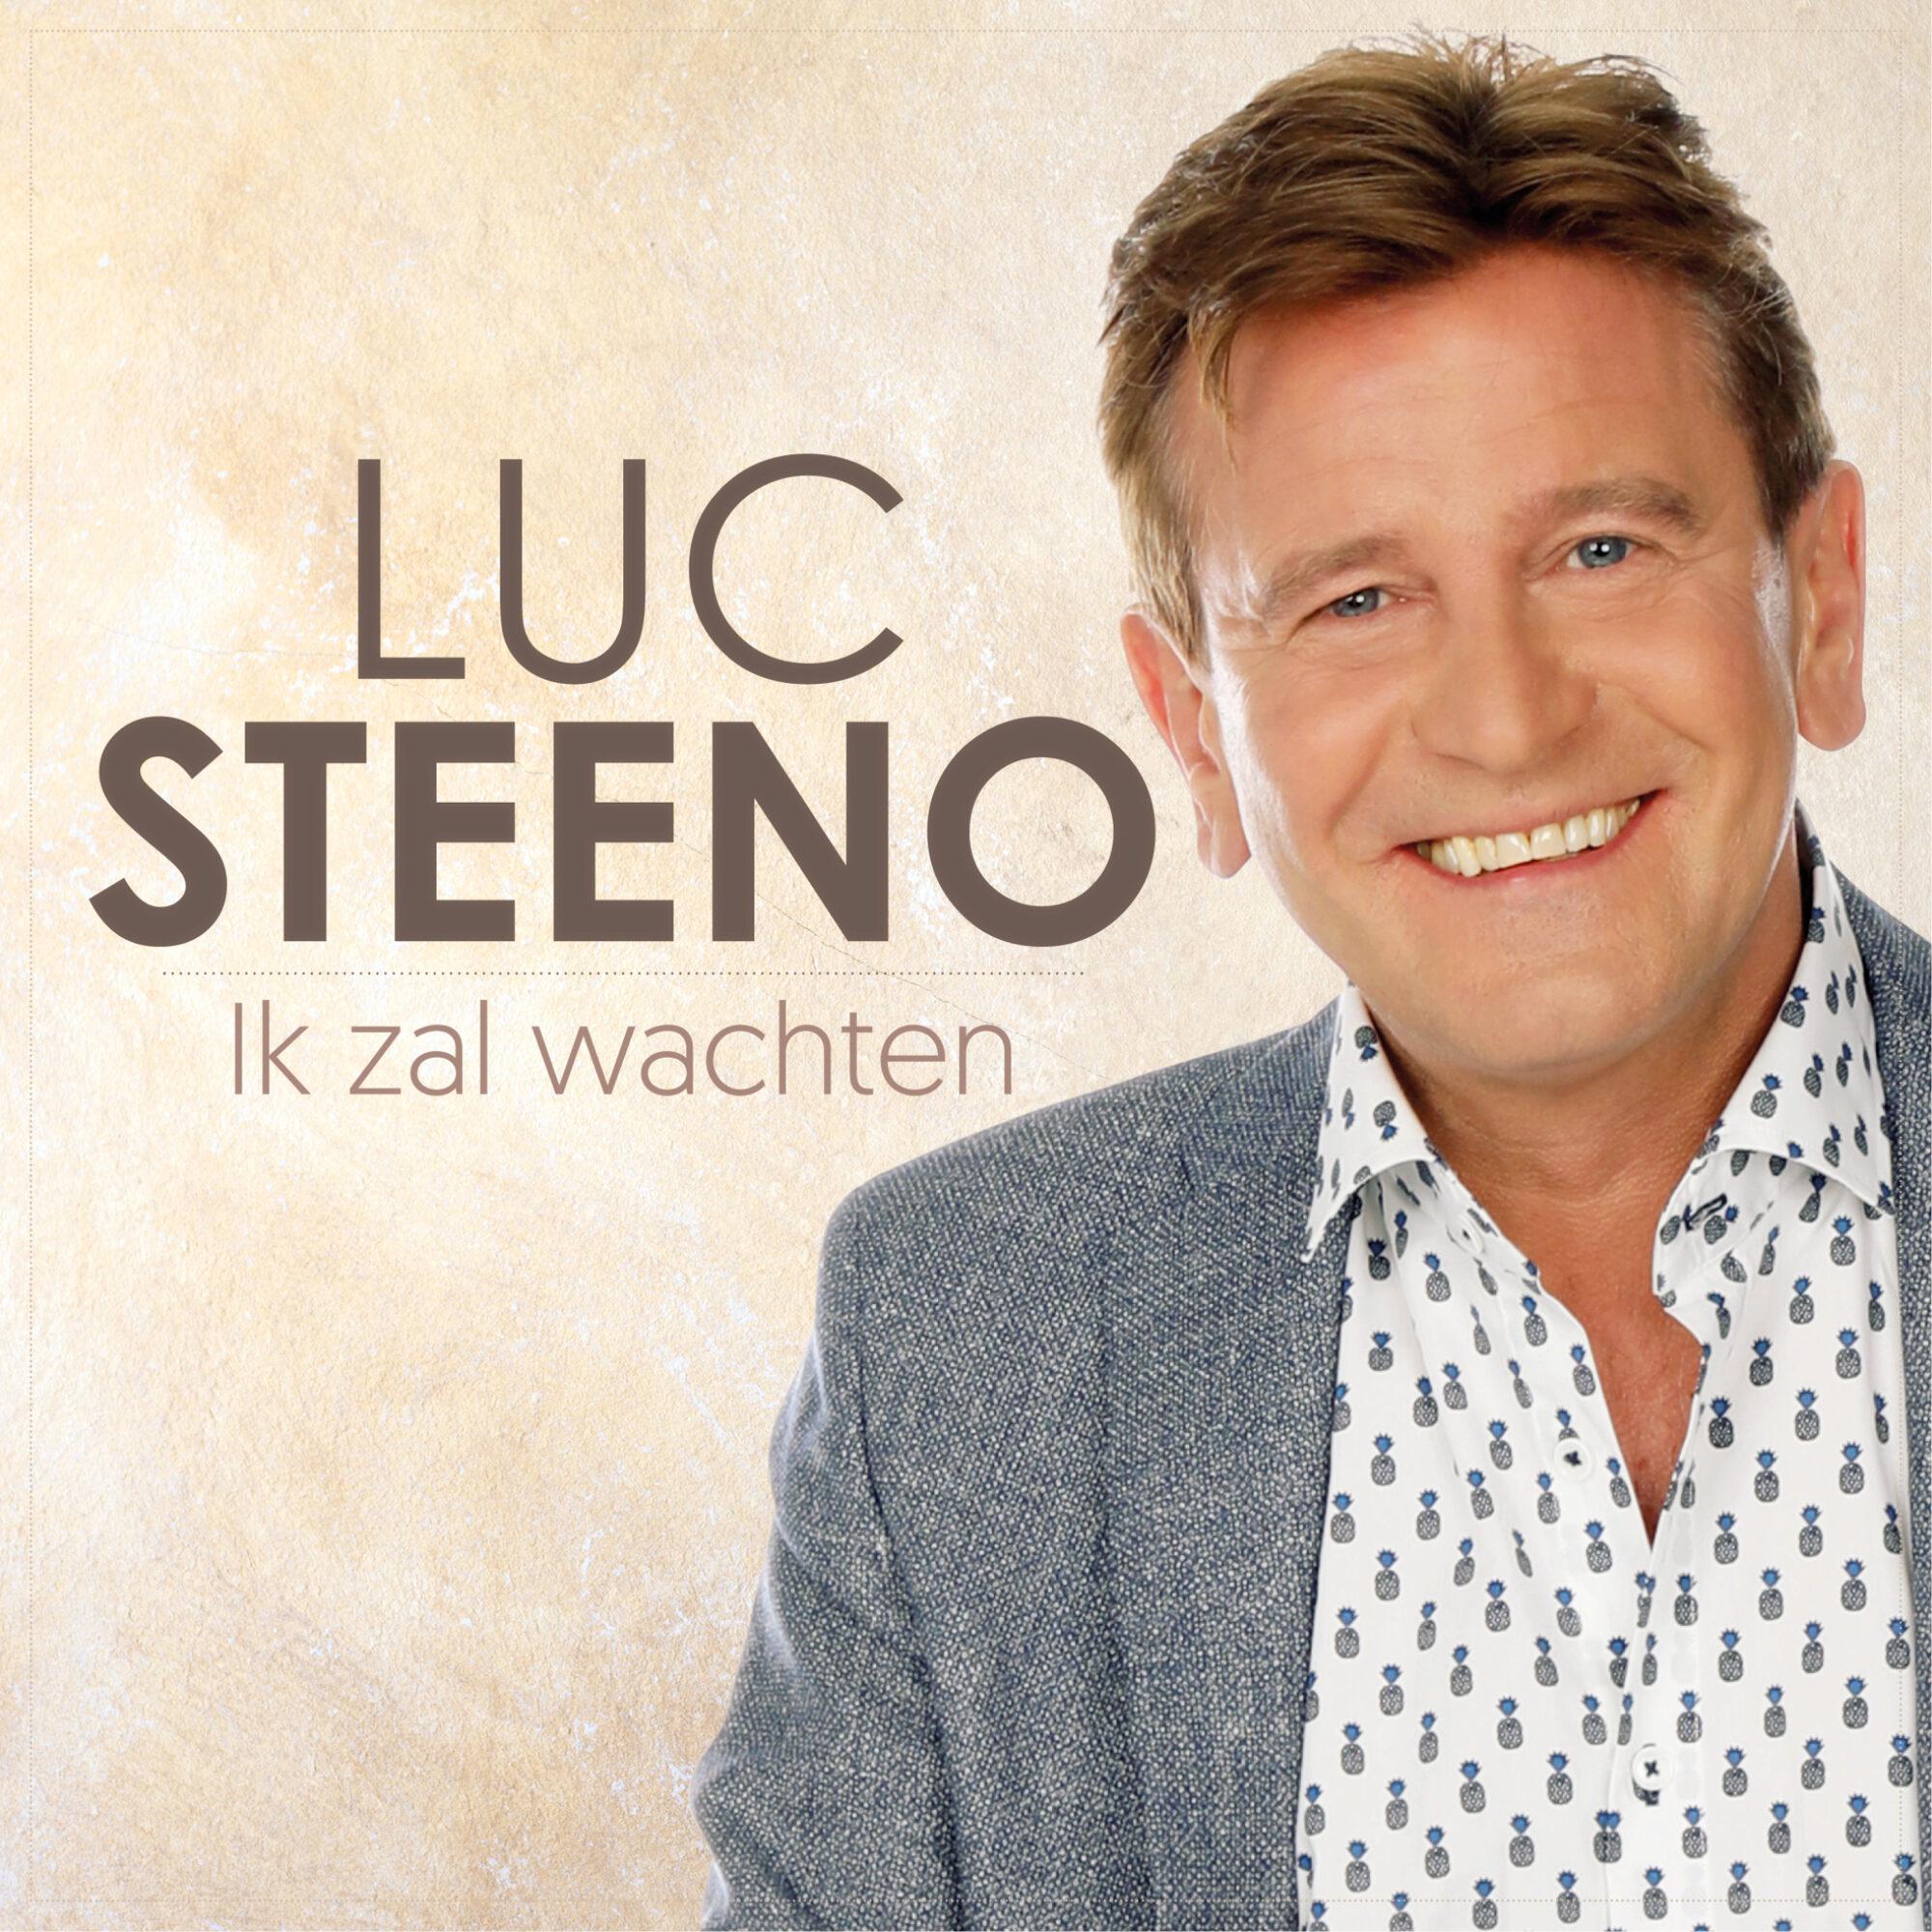 Luc Steeno Ik Zal Wachten